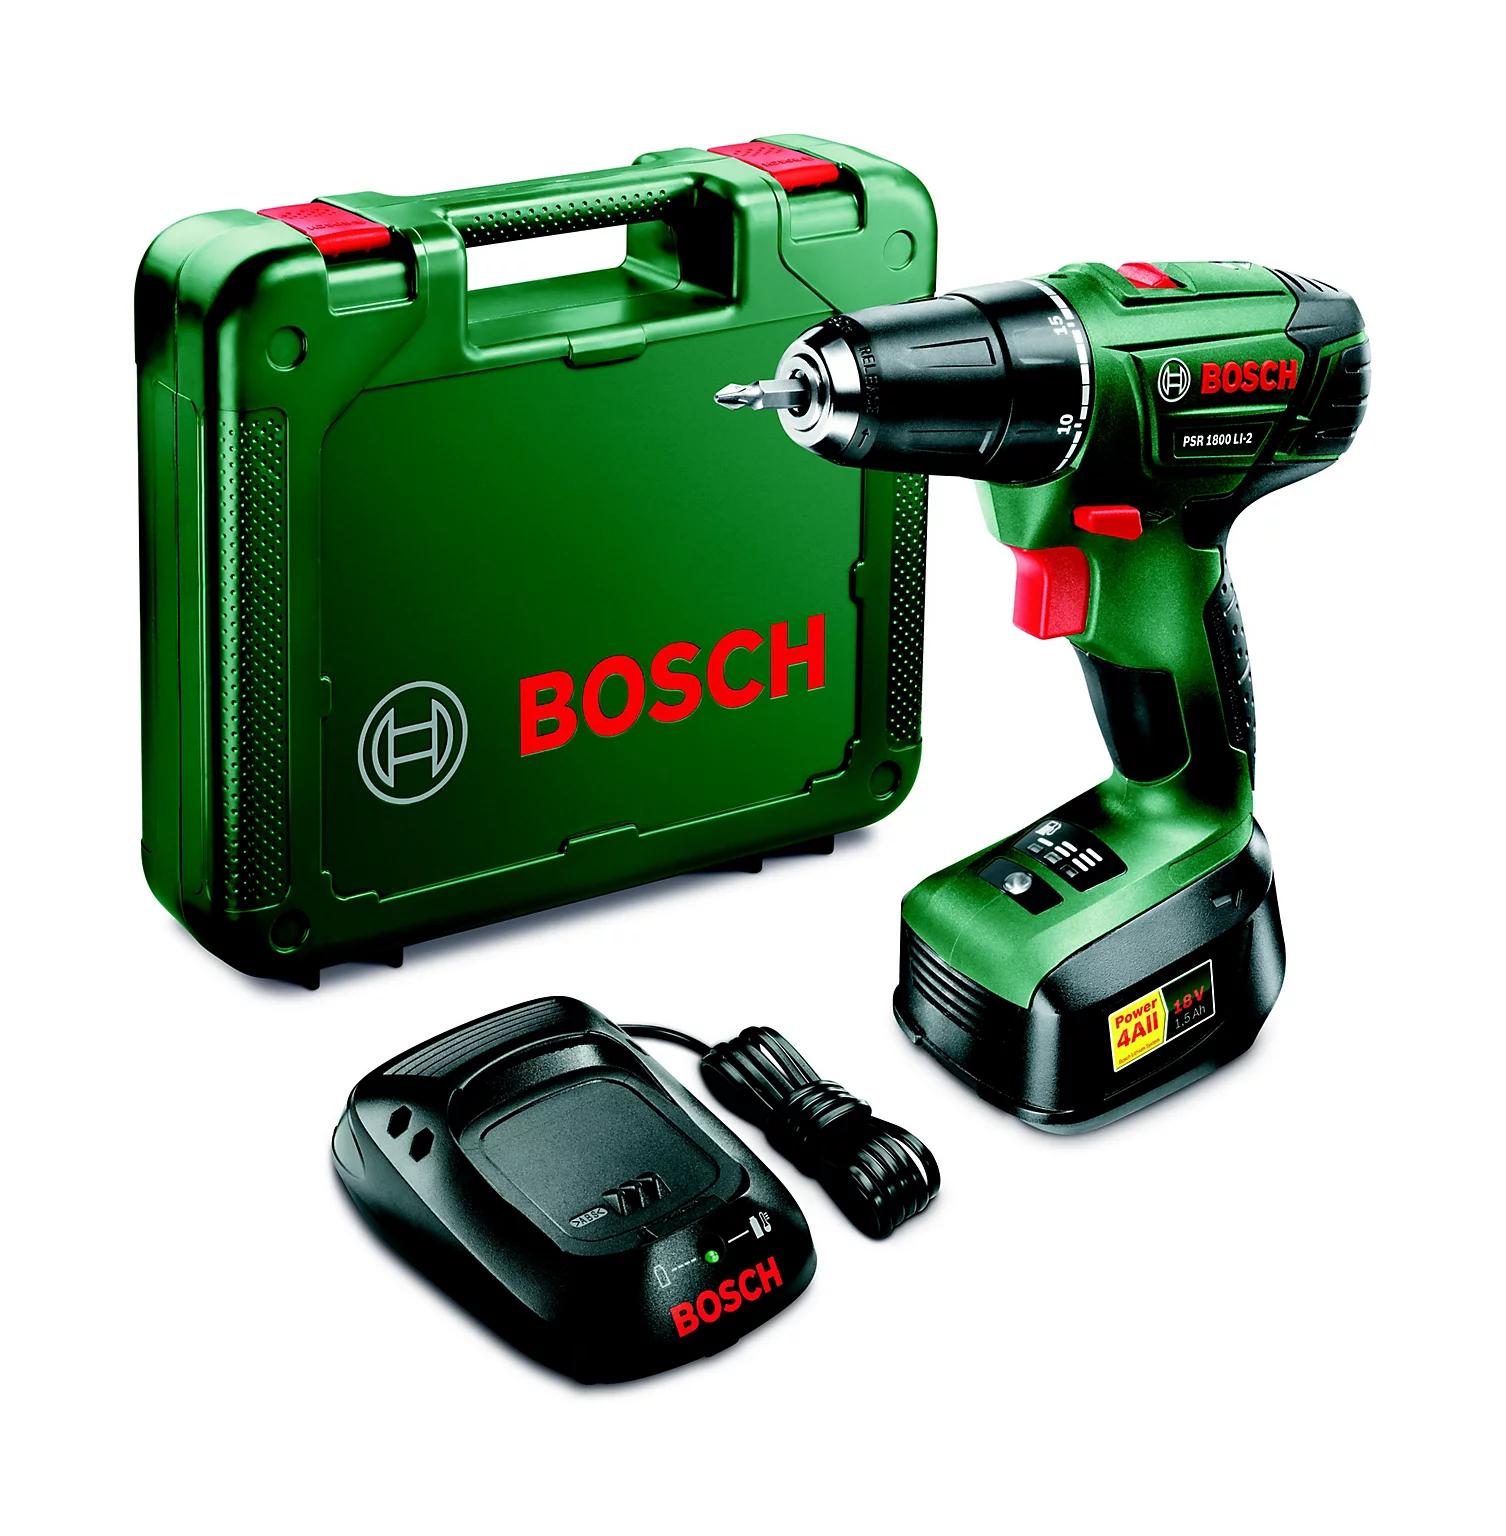 Coffret perceuse-visseuse sans-fil Bosch PSR 1800 LI-2 (18 V) - avec batterie 1.5 Ah + chargeur (via ODR 15€)